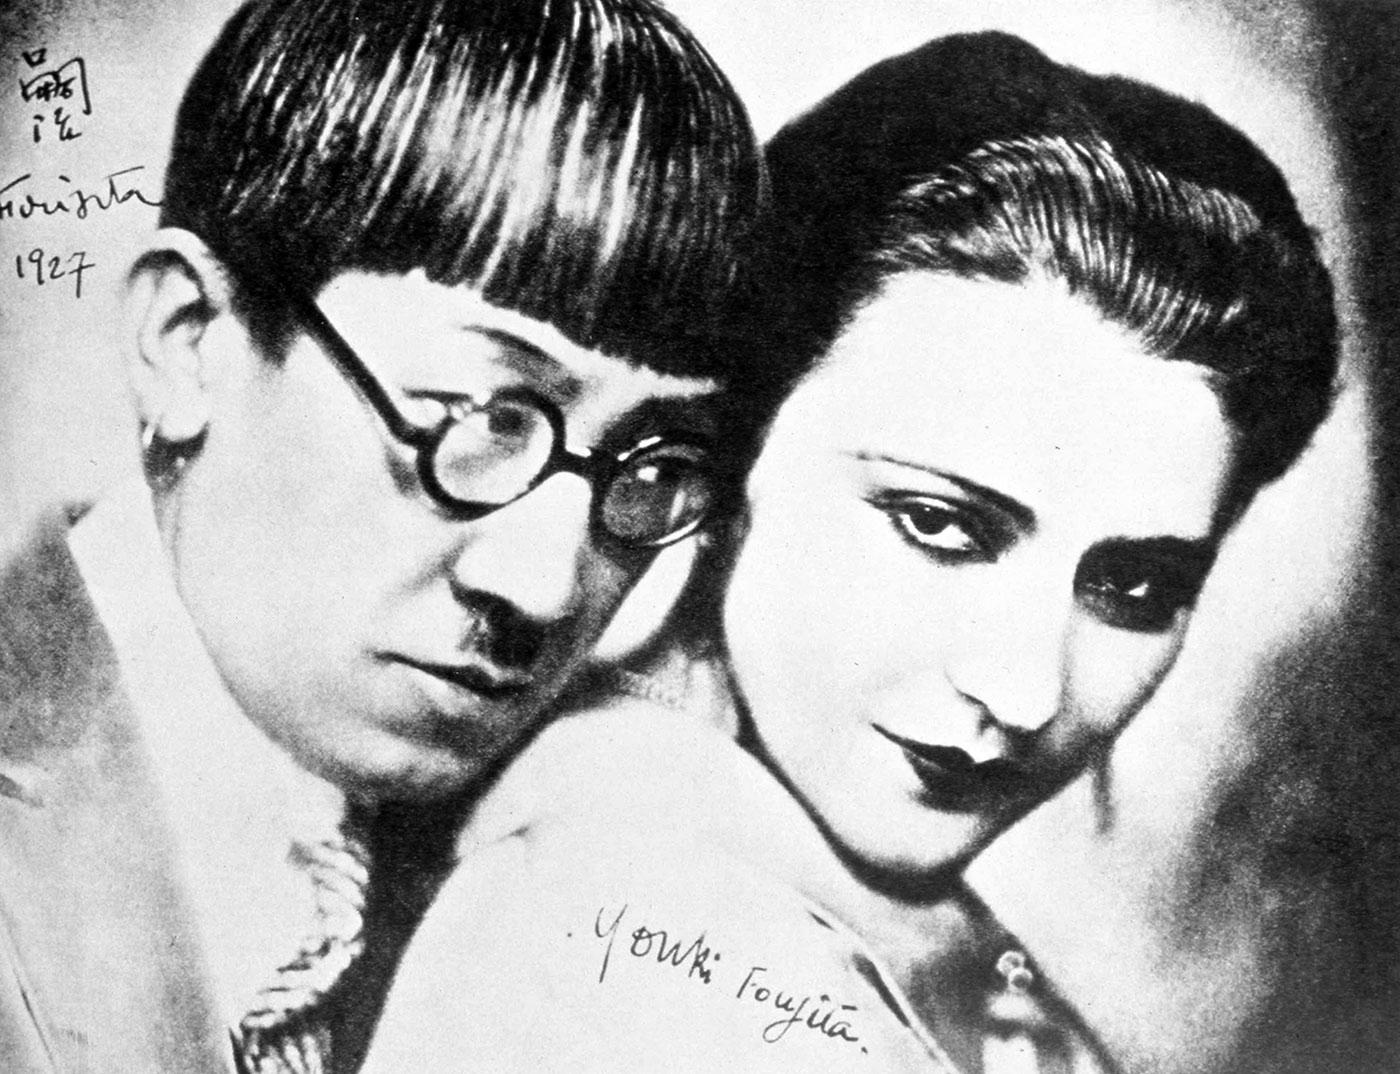 Foujita et Yuki, 1927